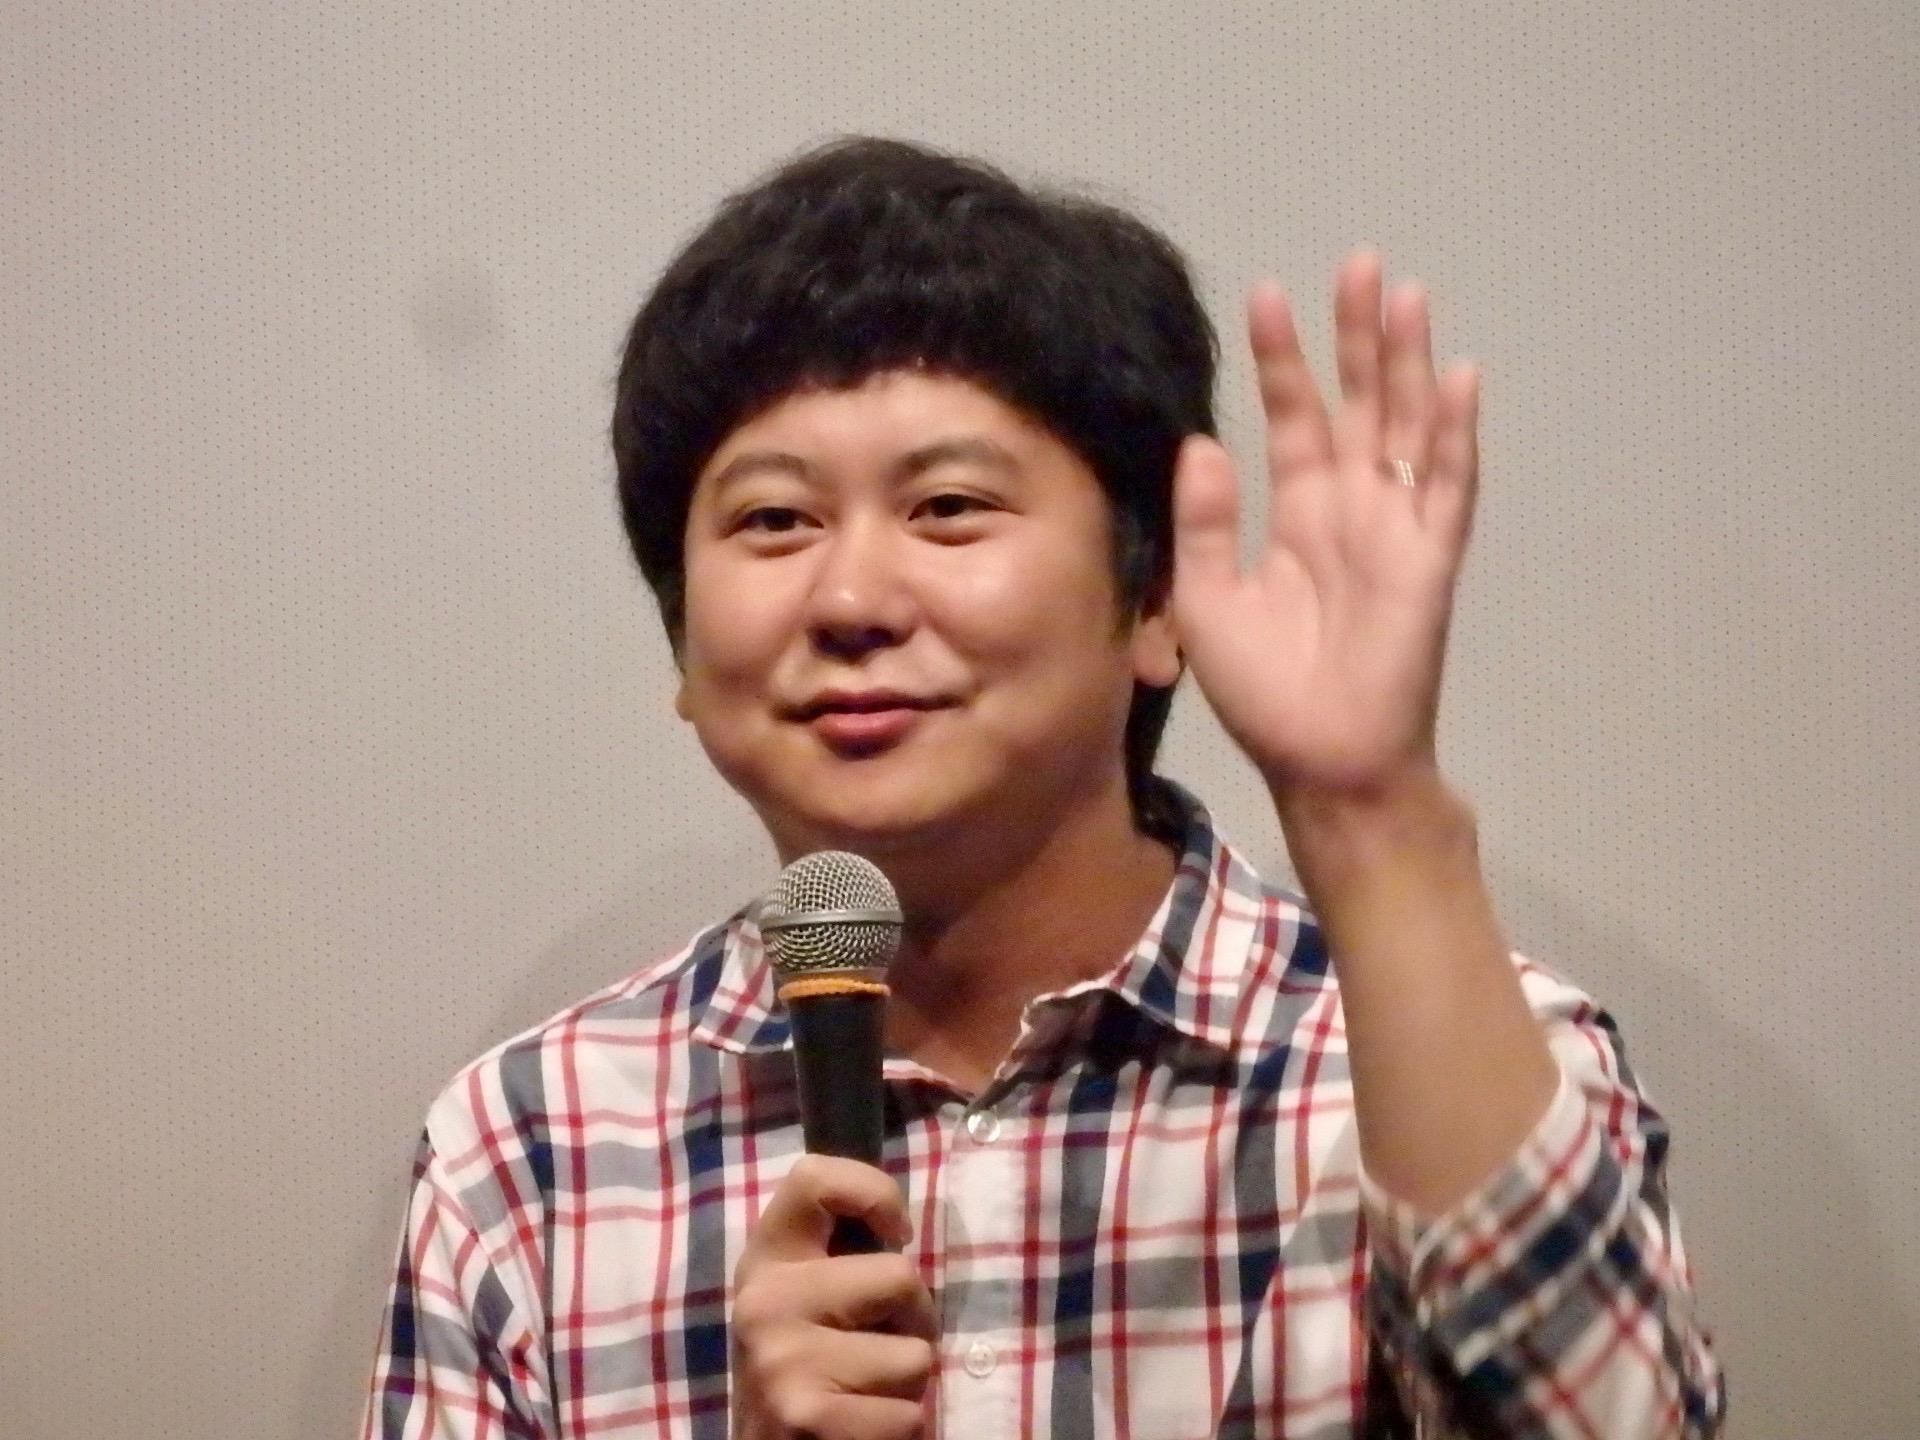 http://news.yoshimoto.co.jp/20171006133629-6d2eb355f11cfe0fe3620a4856201b5c1ce28ae8.jpg